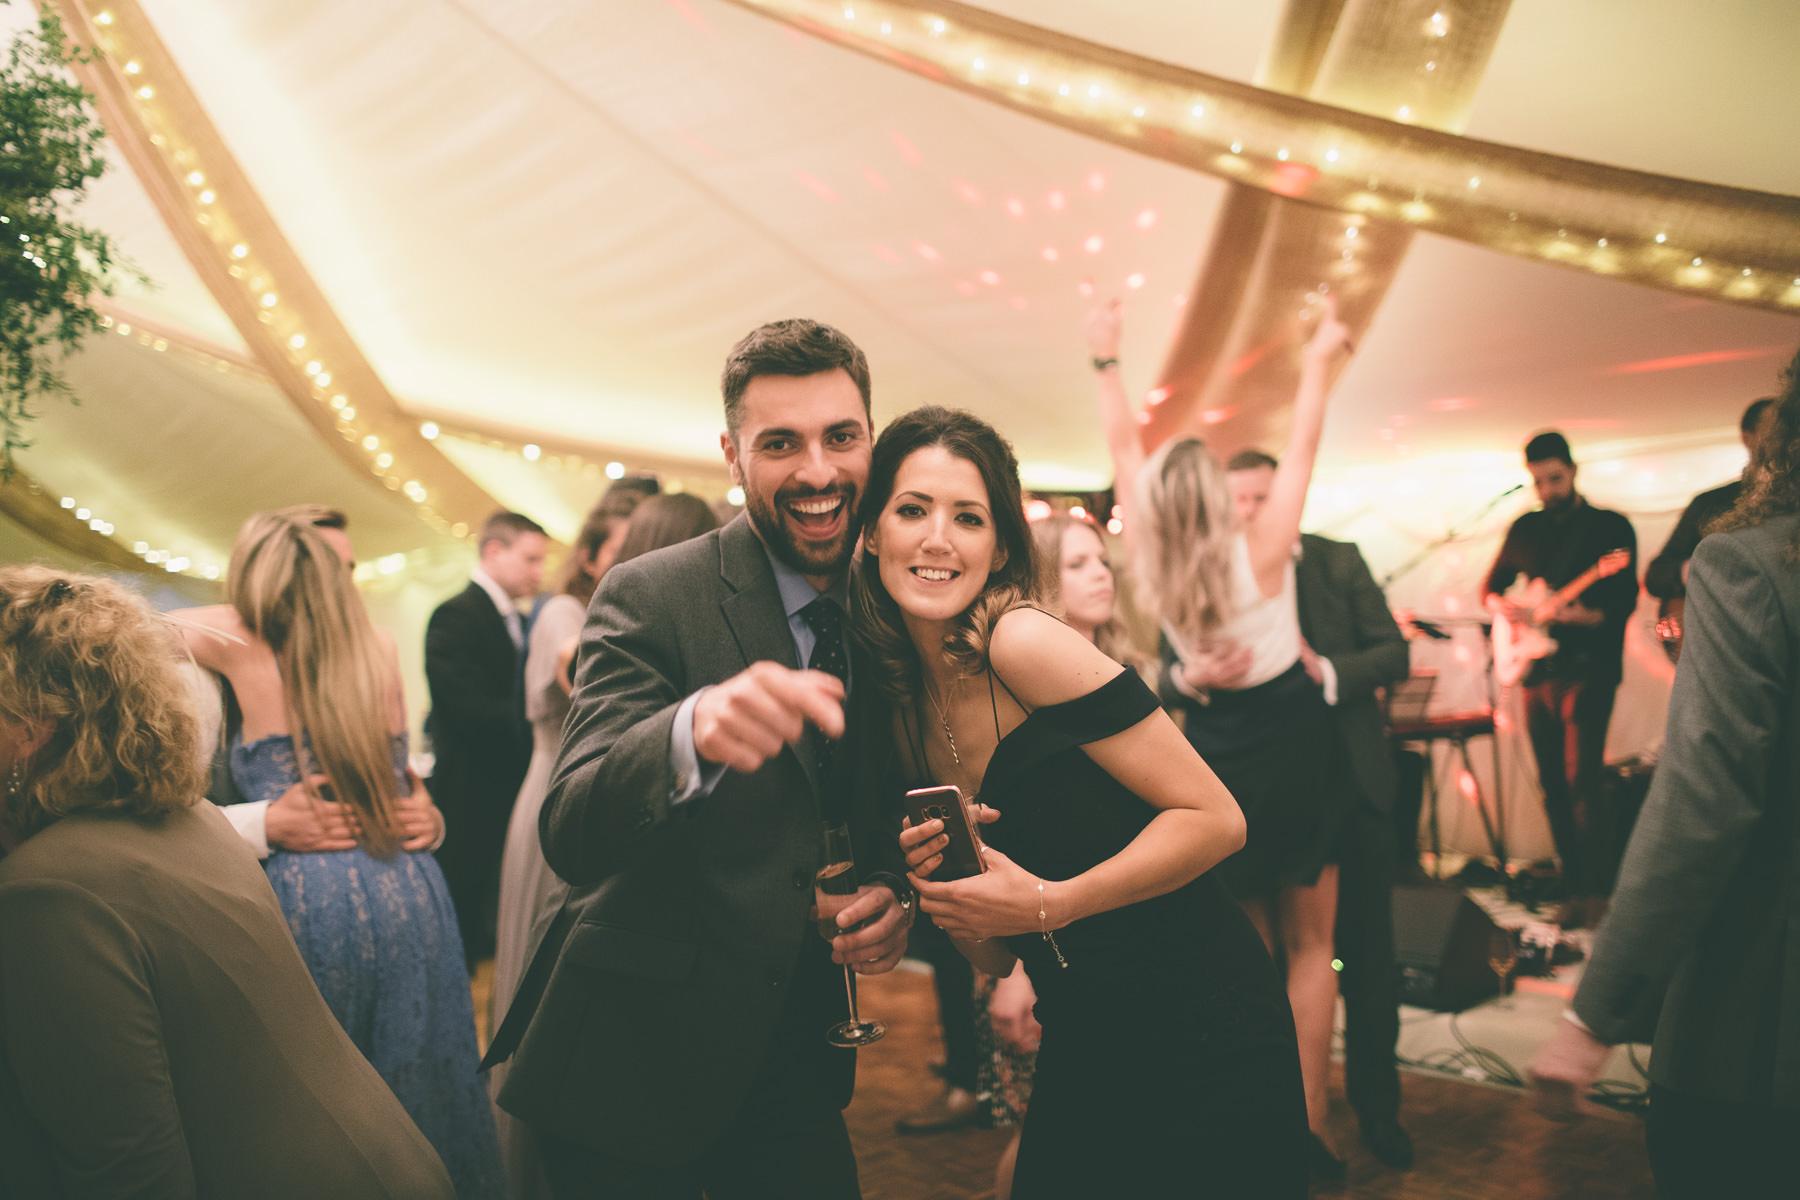 Pamber-Place-wedding-photography-basingstoke-hampshire-254